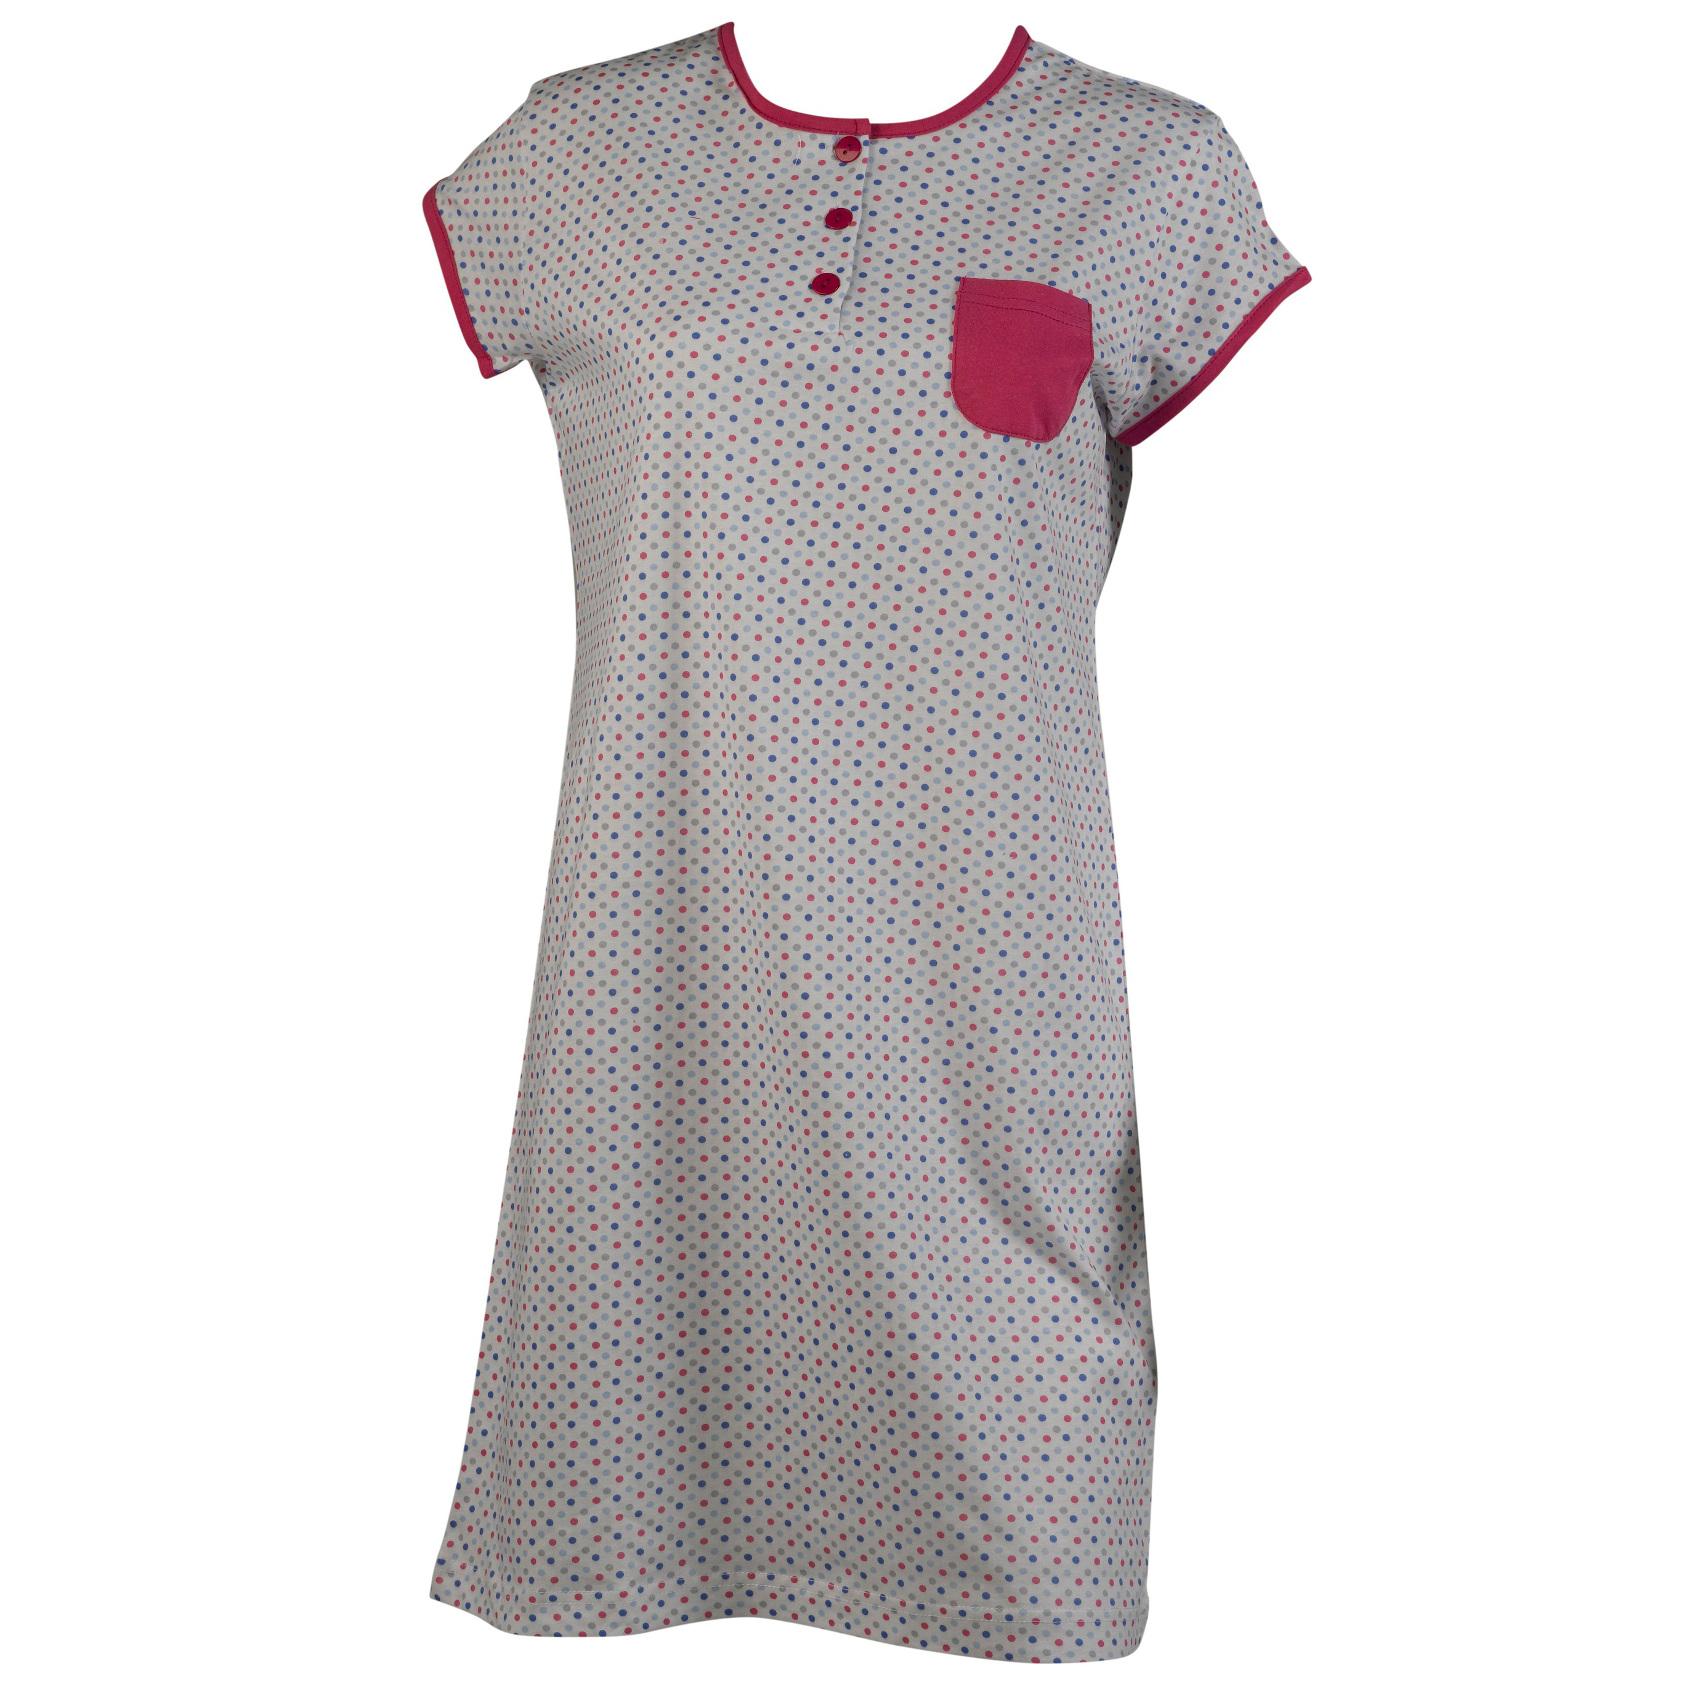 Ladies Short Sleeved Spotty Night Dress 100% Cotton Womens Polka Dot Nightie e5df0f836